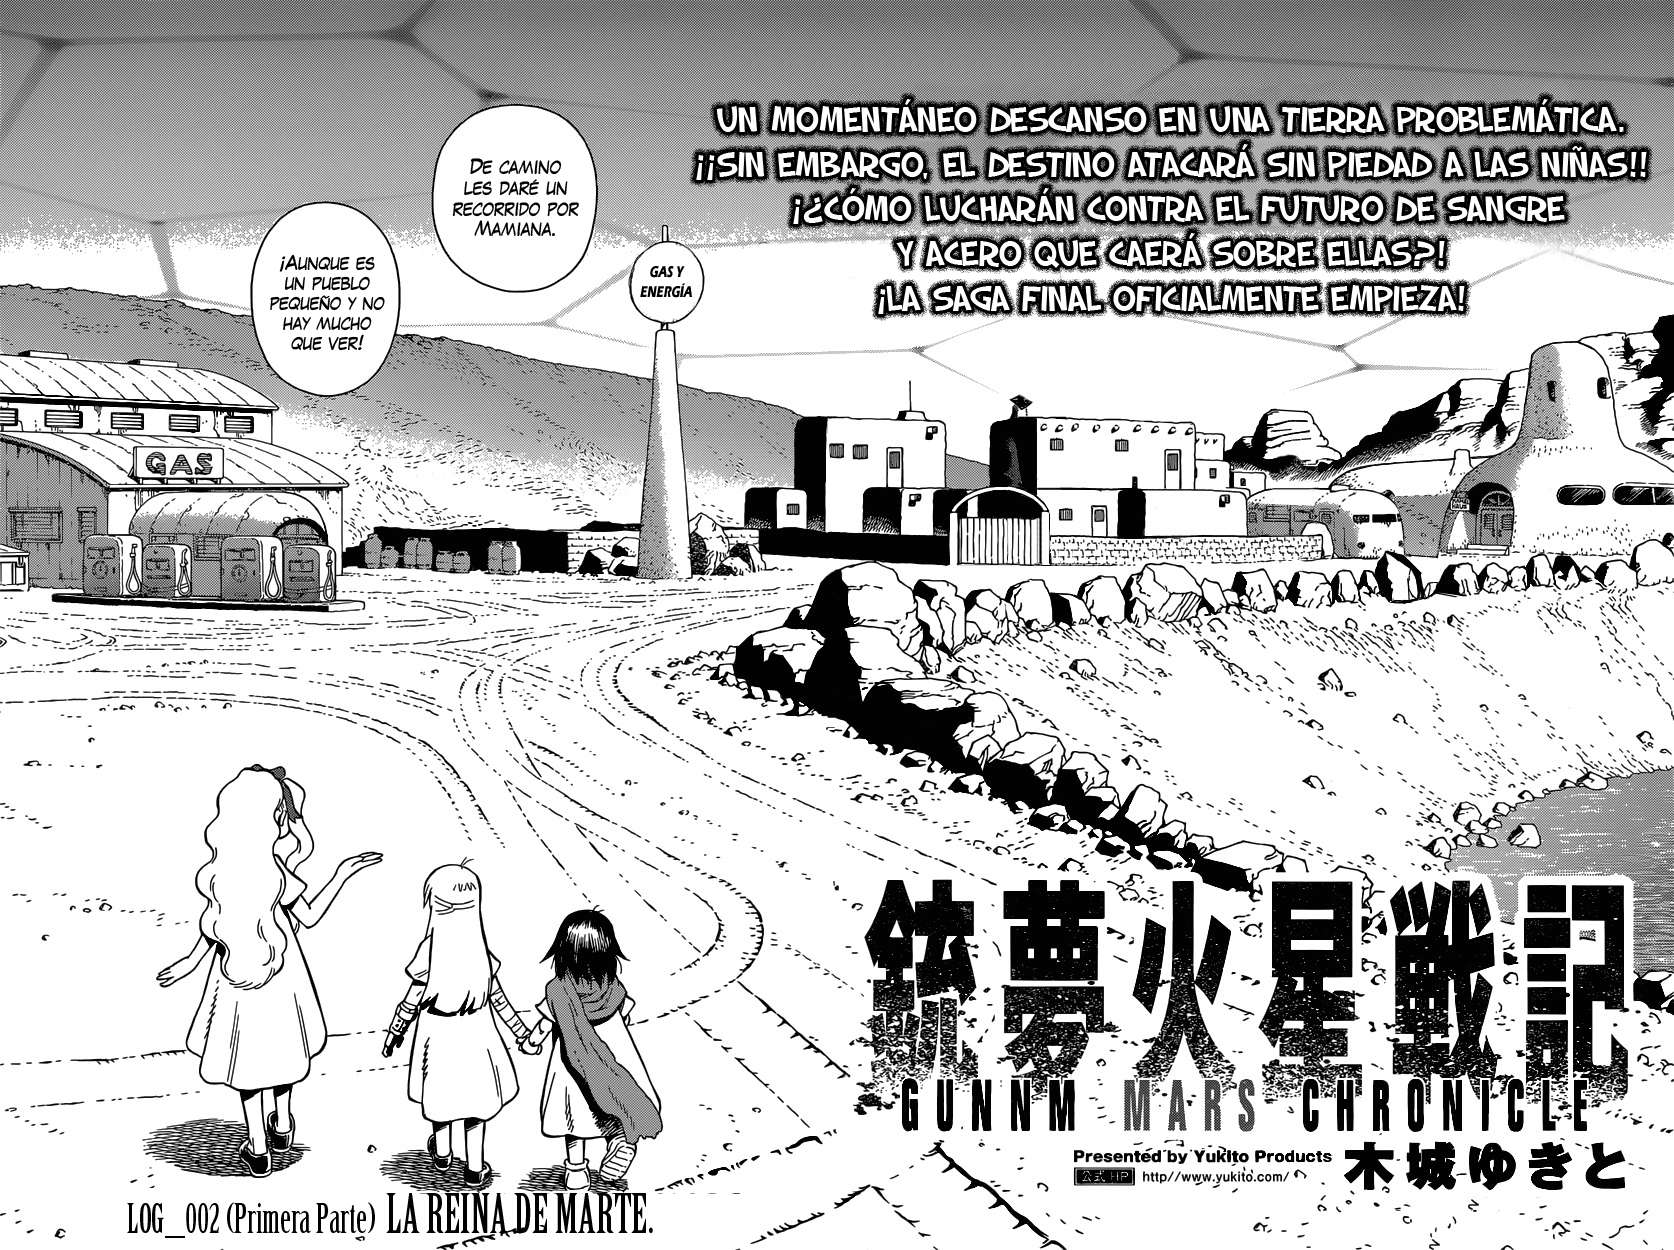 https://c5.ninemanga.com/es_manga/41/18217/423007/db24907625924b6c0ce4eb4b4f7c75da.jpg Page 2